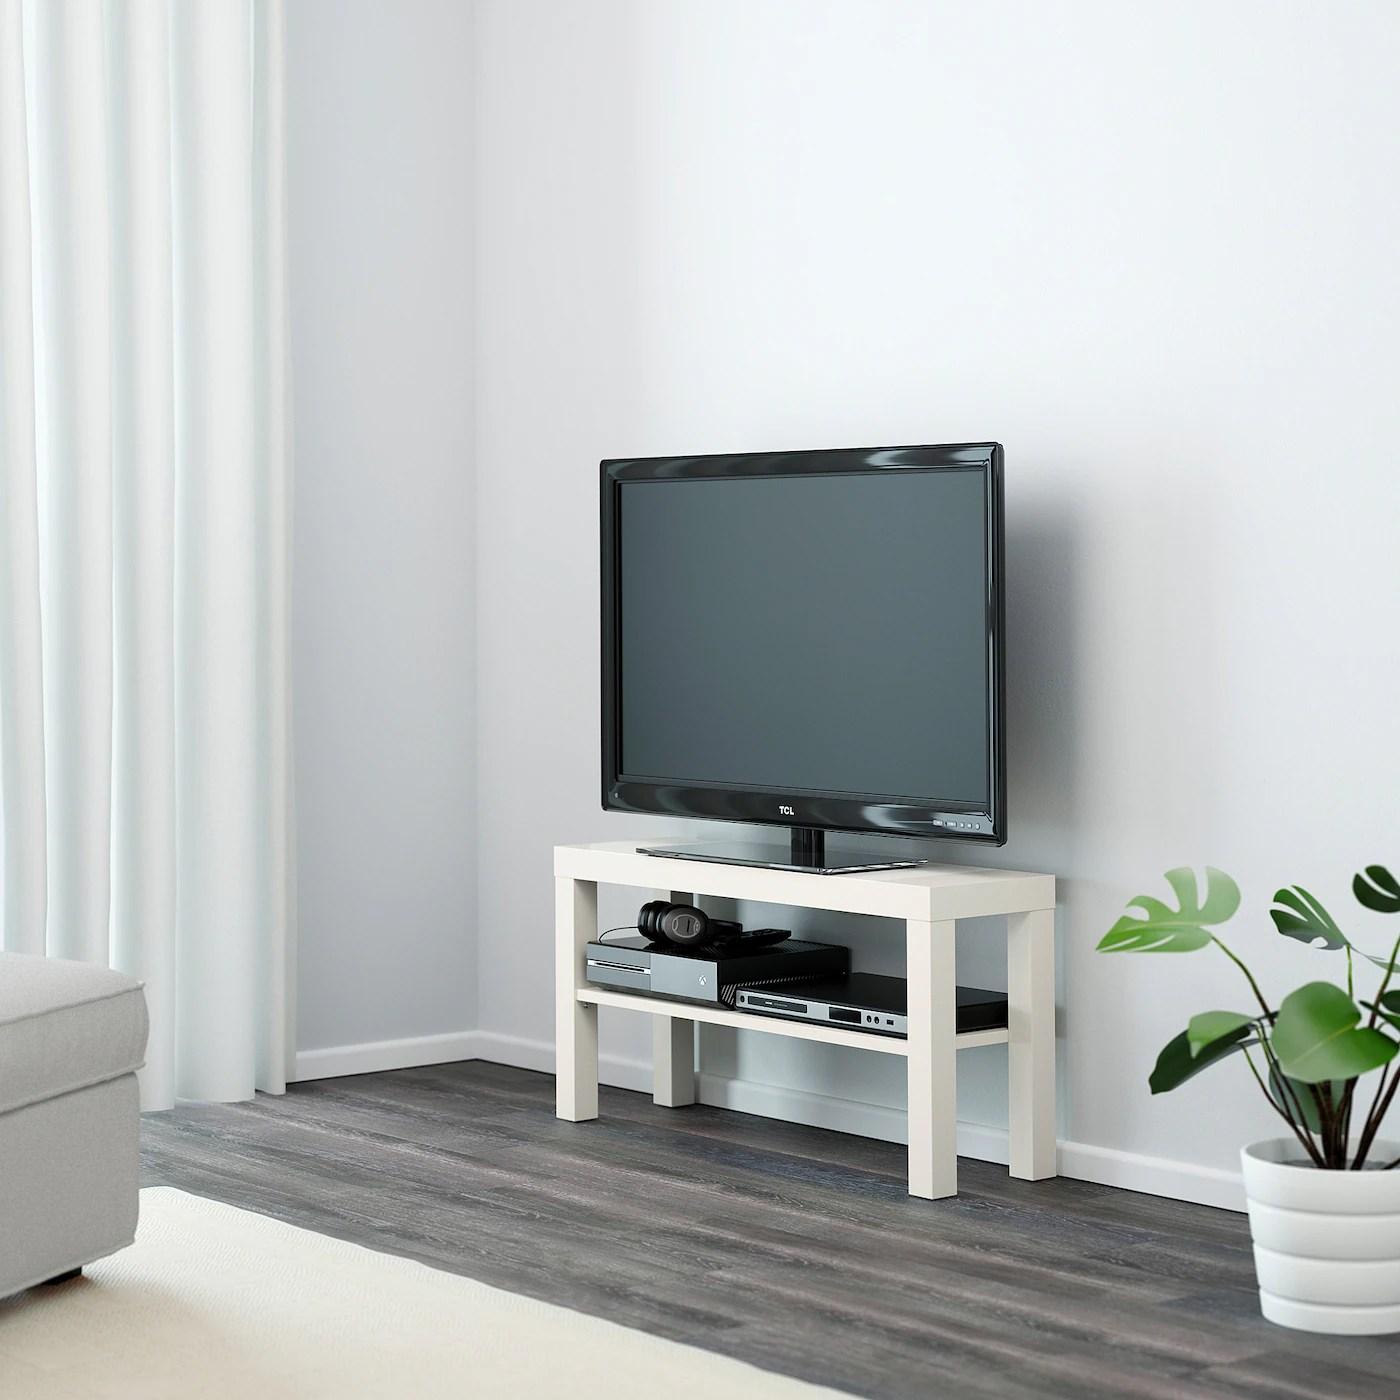 lack banc tv blanc 90x26x45 cm